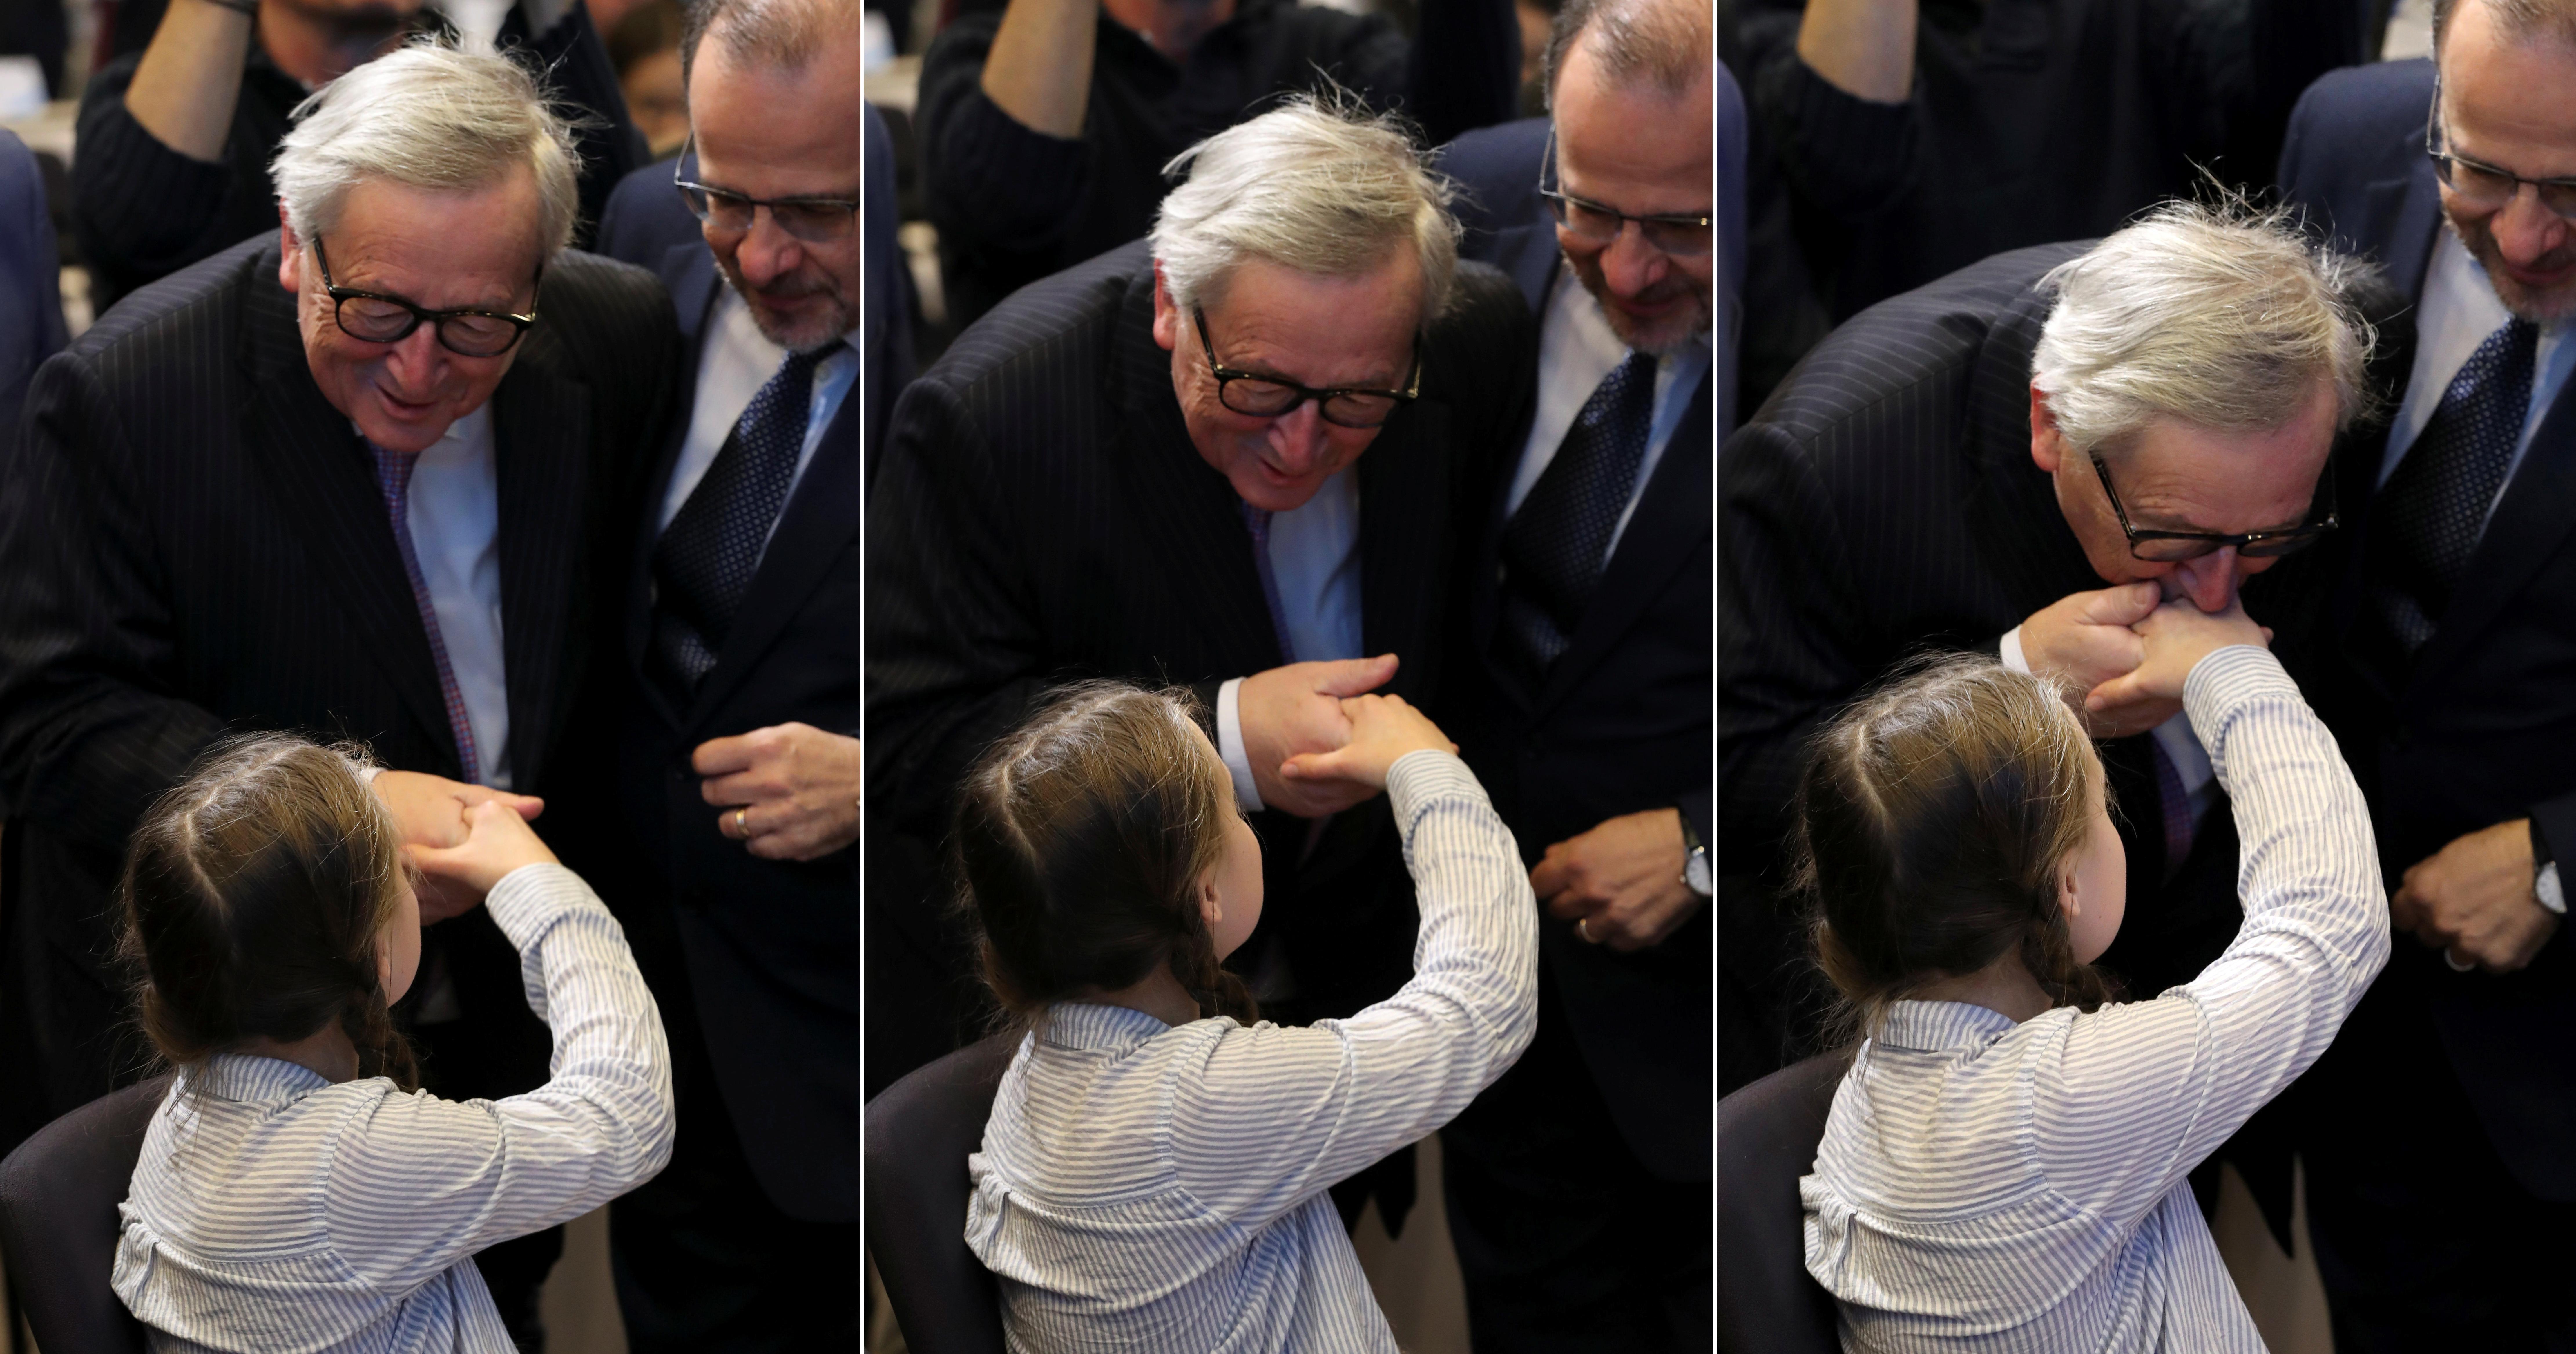 Brussels - Swedish Student Leader Wins EU Pledge To Spend ...